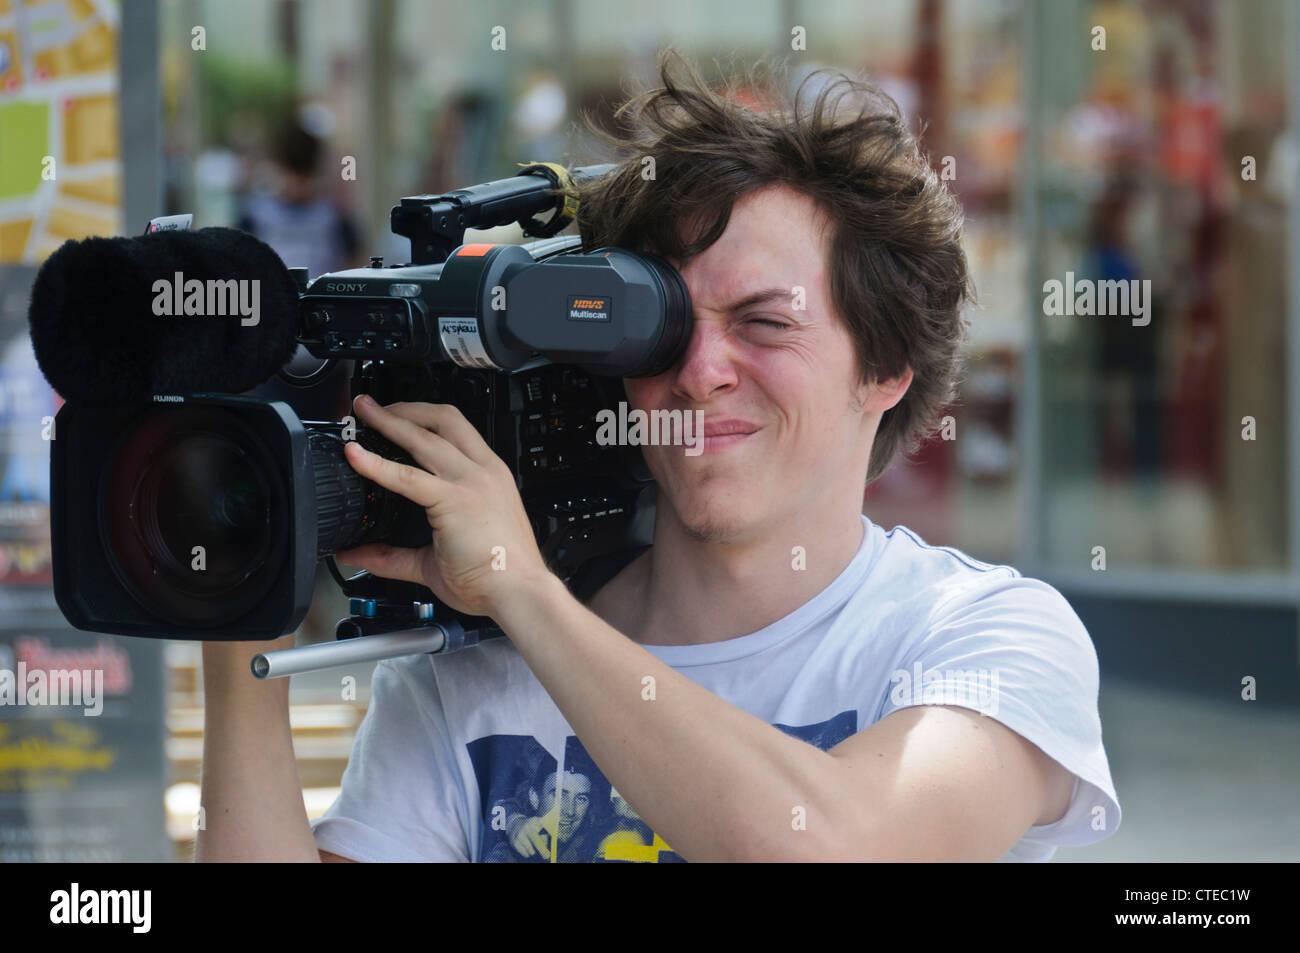 Television TV Cameraman with SONY XDCAM Power HAD FX HDVS Multiscan Digital TV Camera Fujinon Super Wide TV Zoom - Stock Image